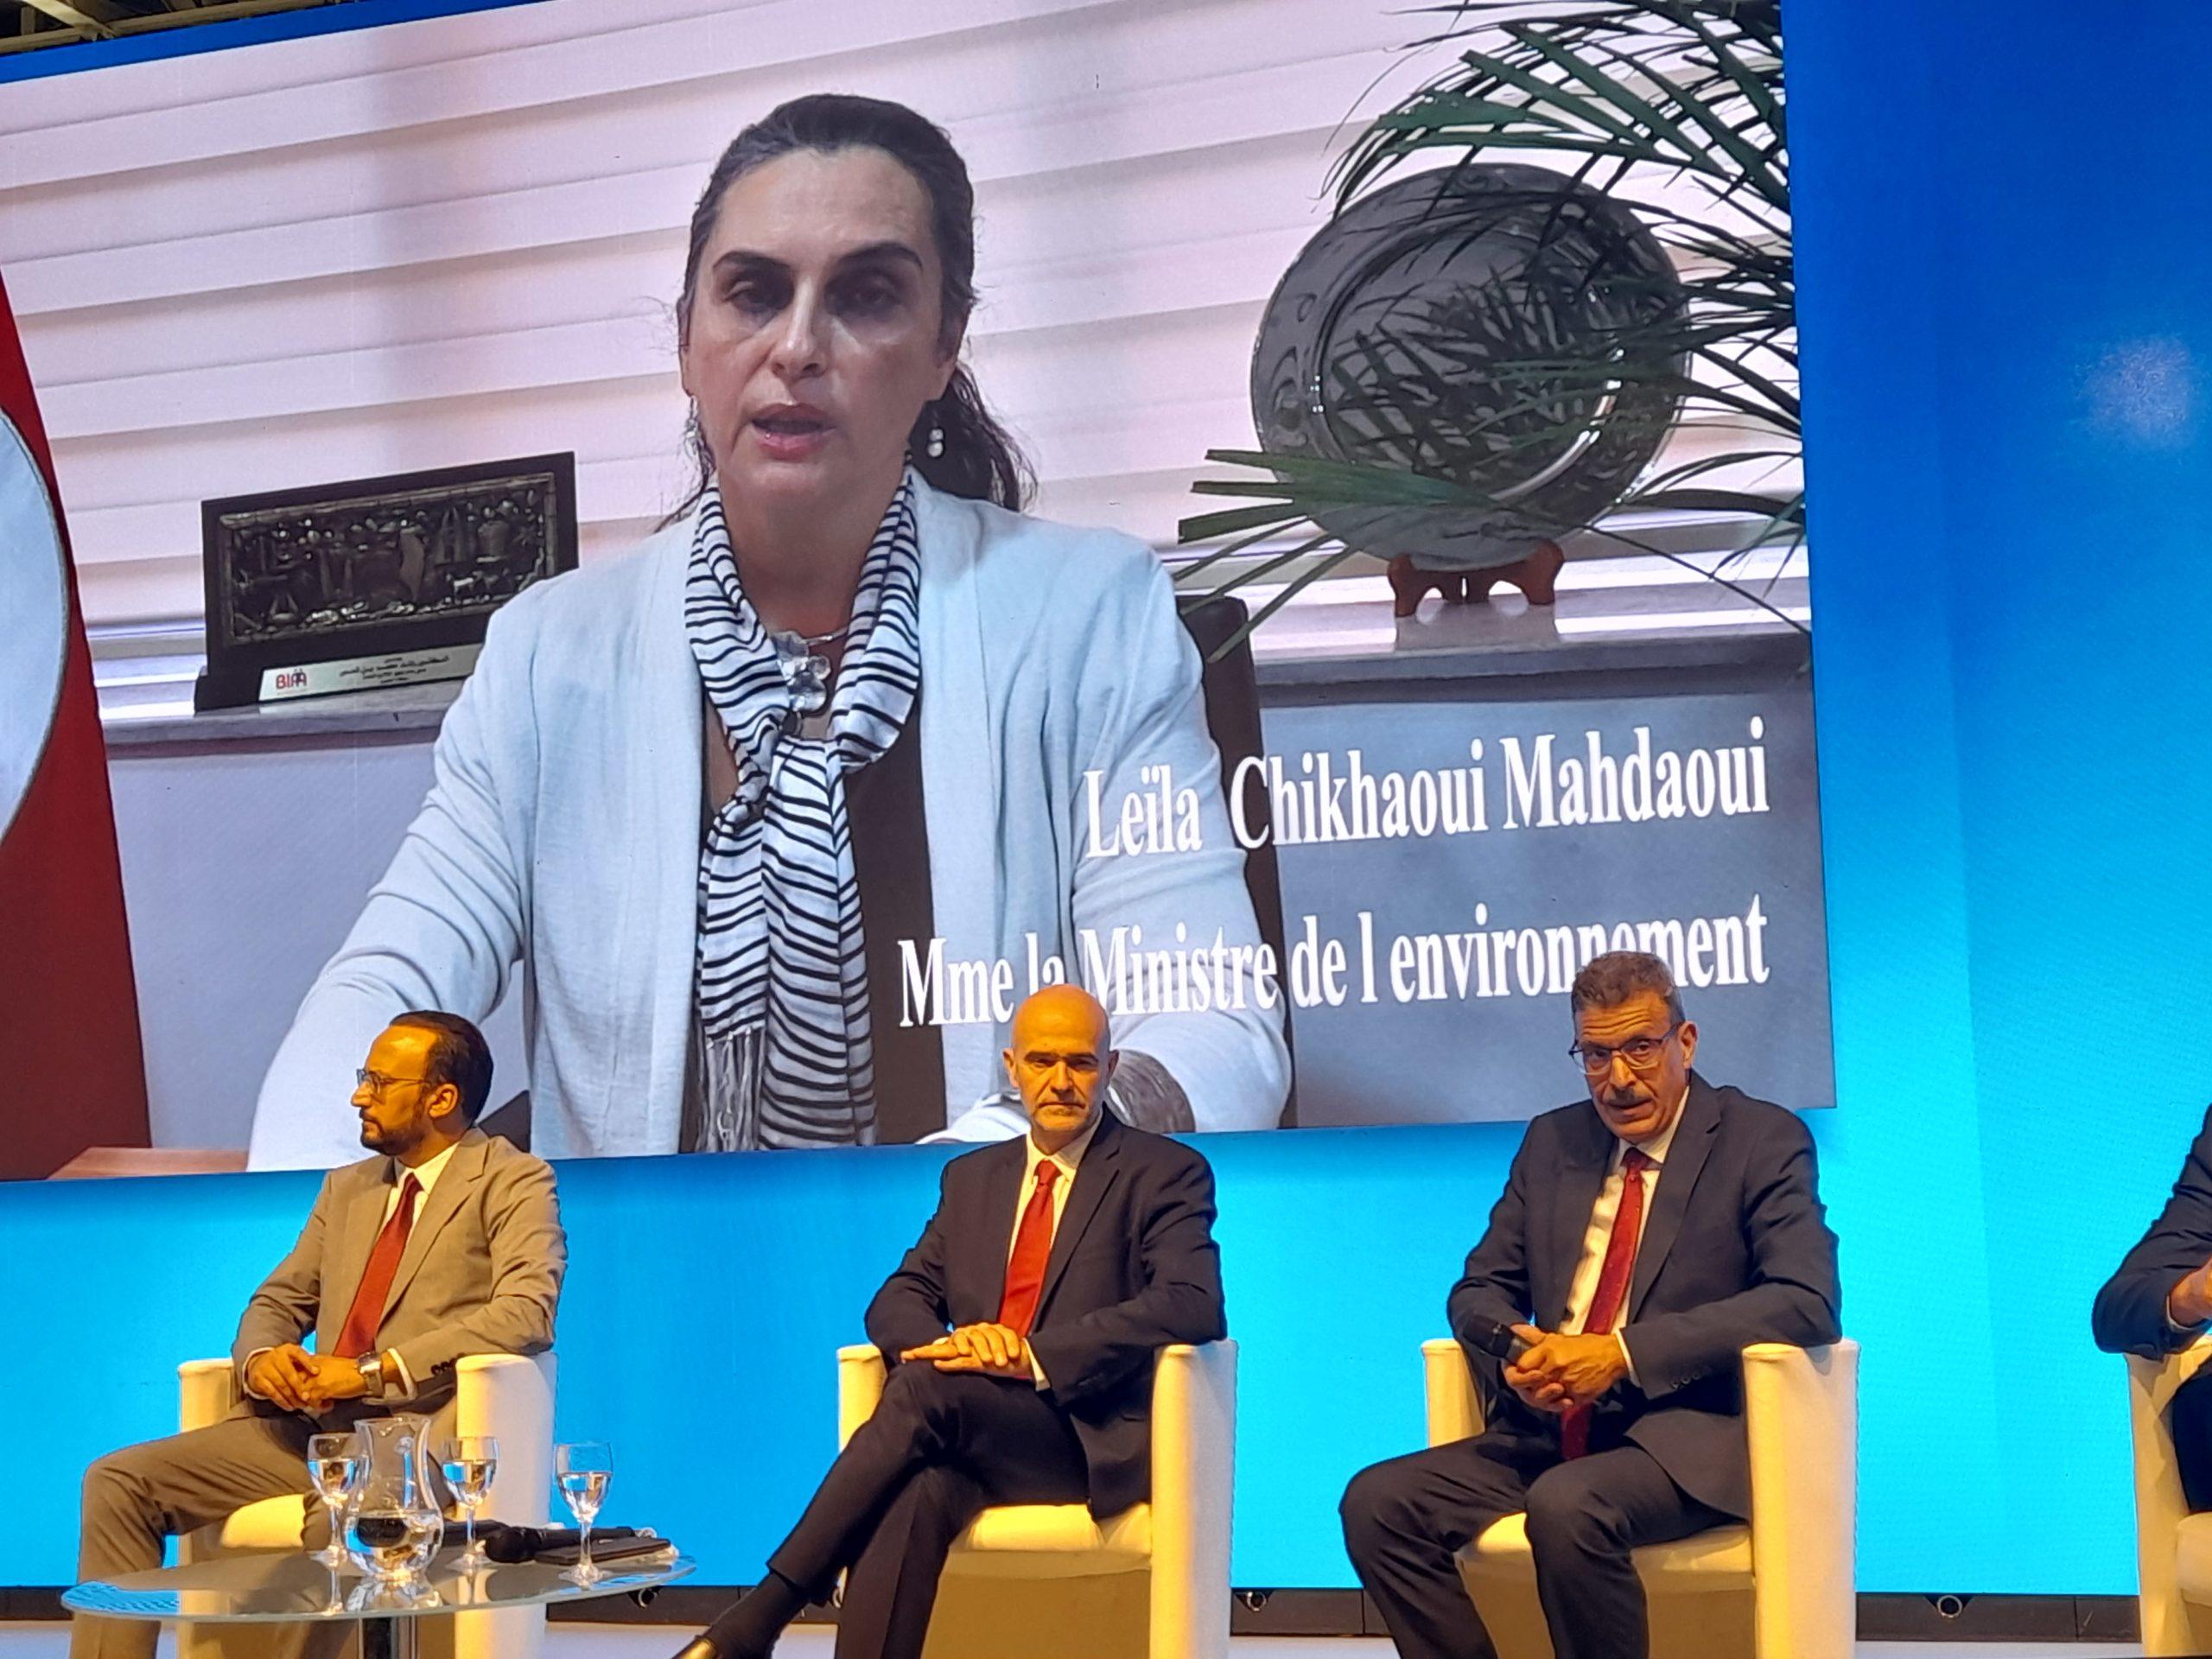 Leila Chikhaoui Mahdaoui